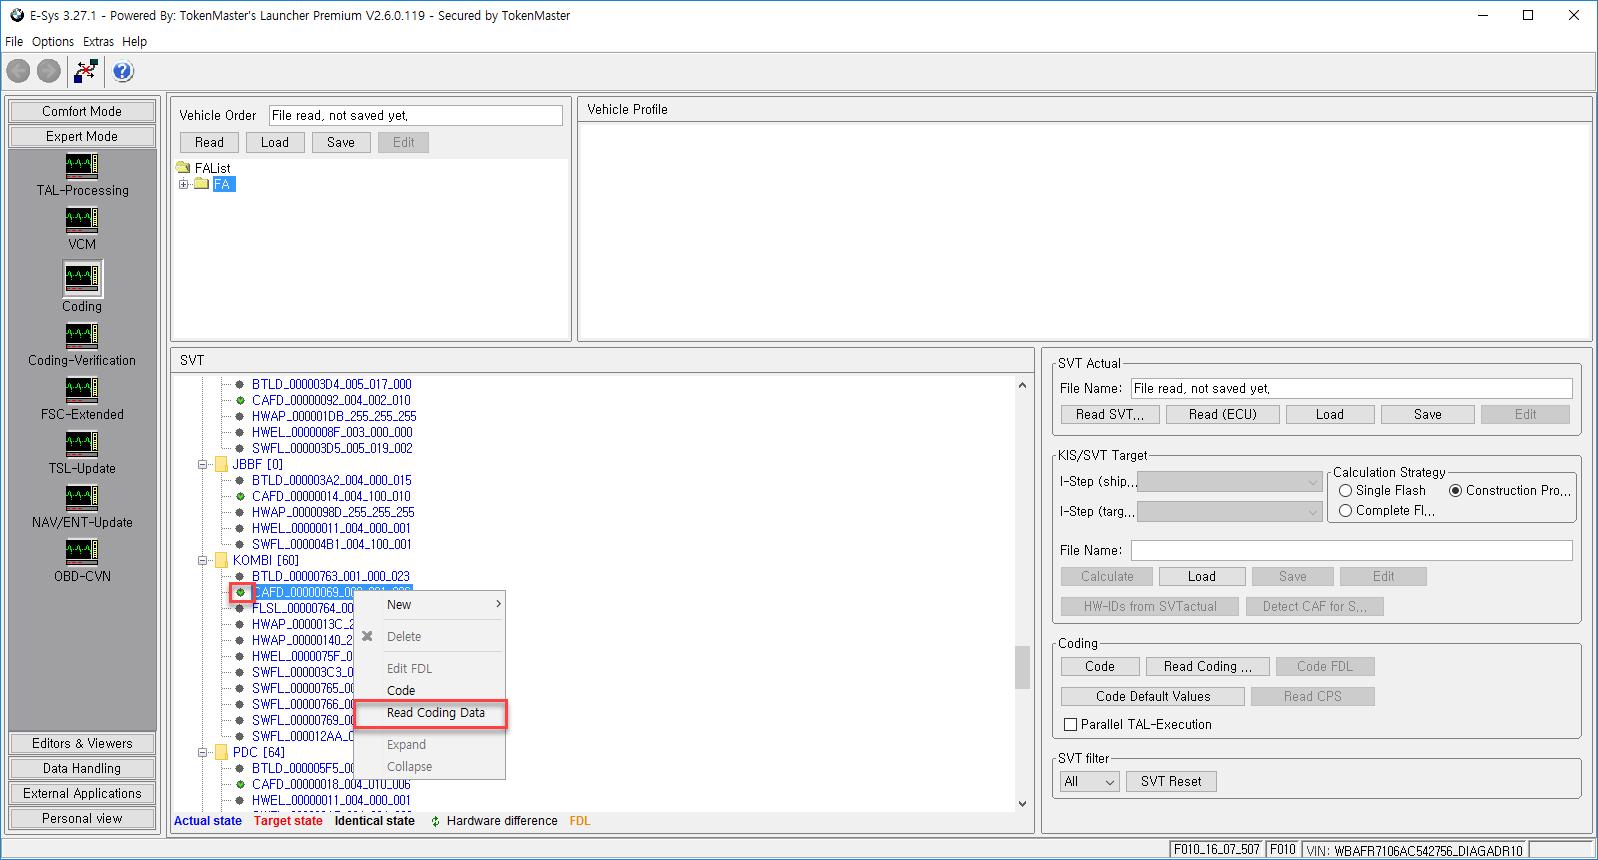 bmw-f15-x5-fdl-coding-by-bmw-esys-bmw-enet-cable-4